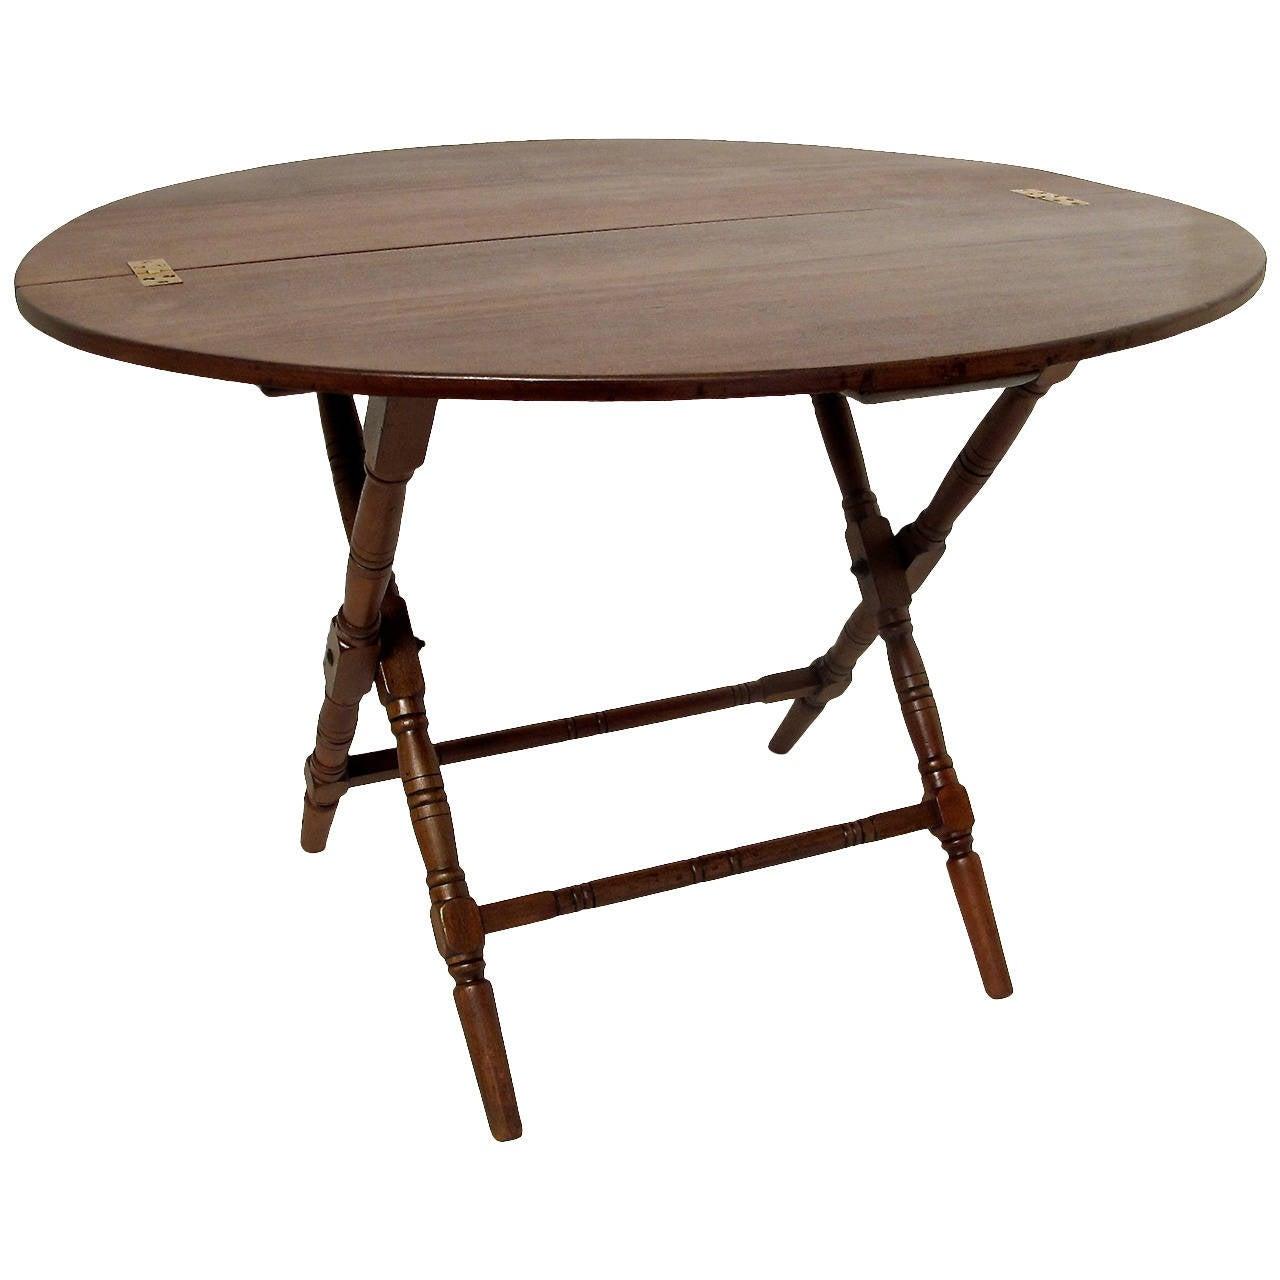 19th Century Walnut Campaign Table